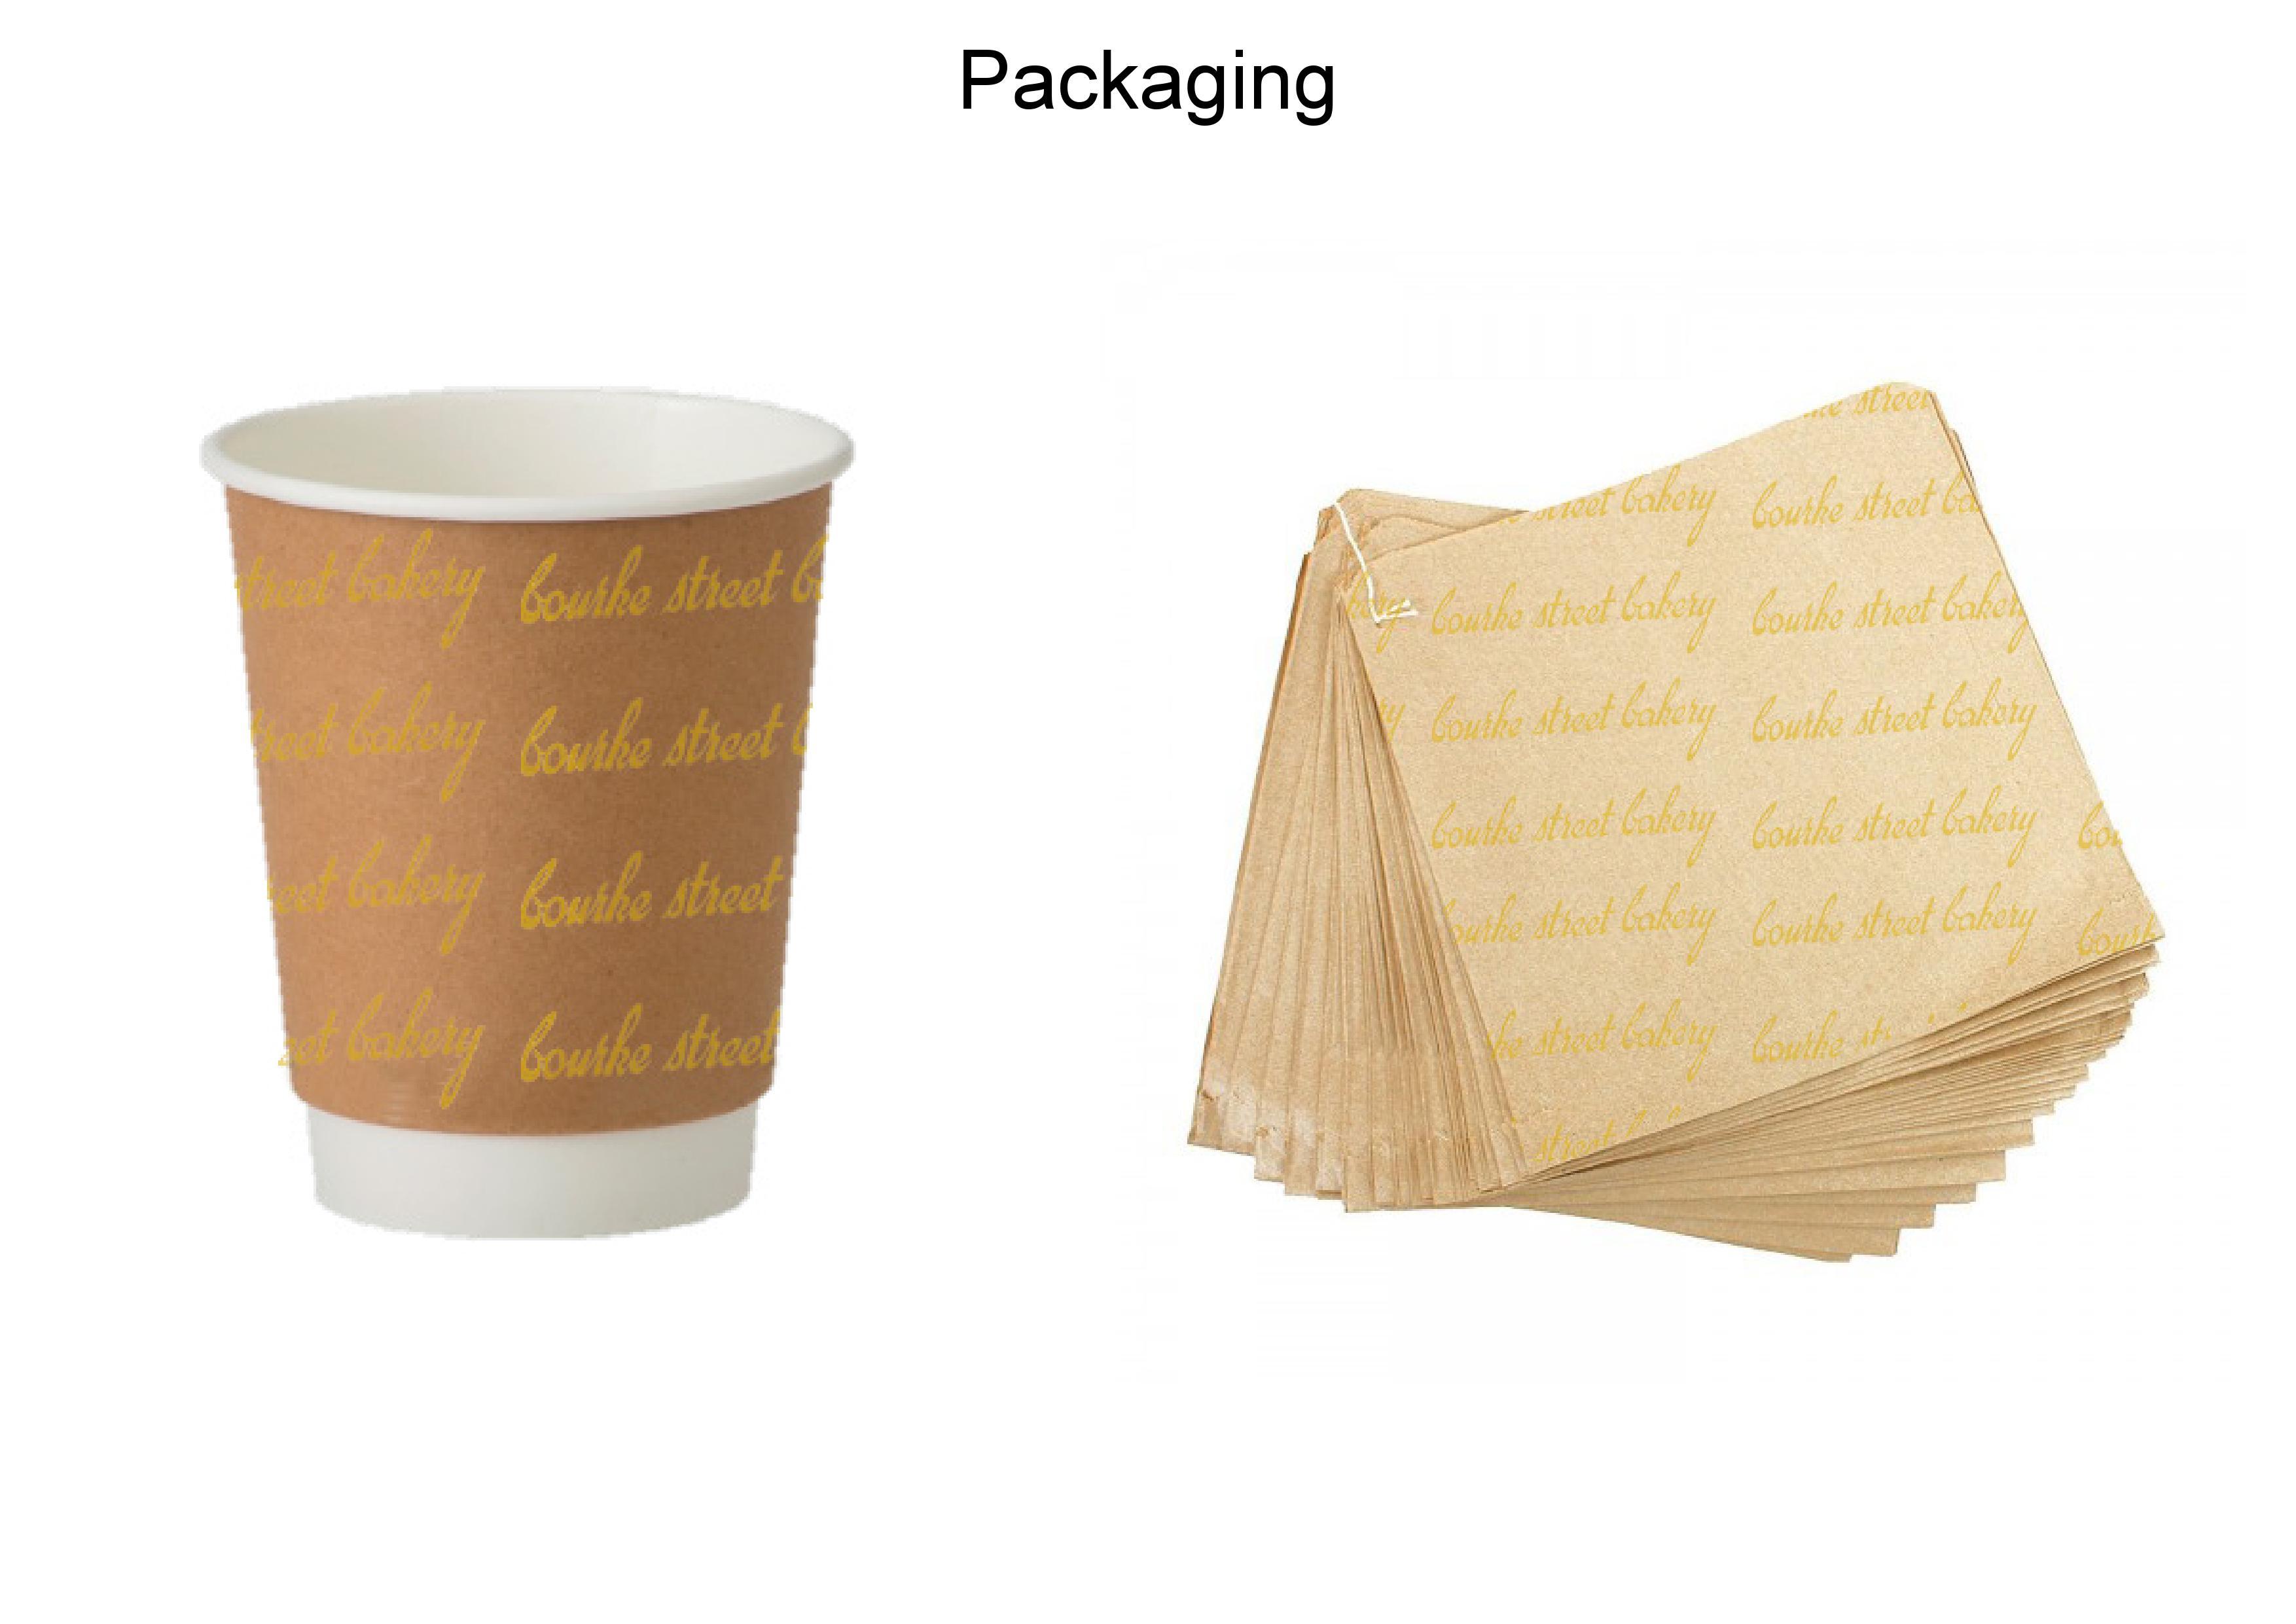 New Packaging - Branding